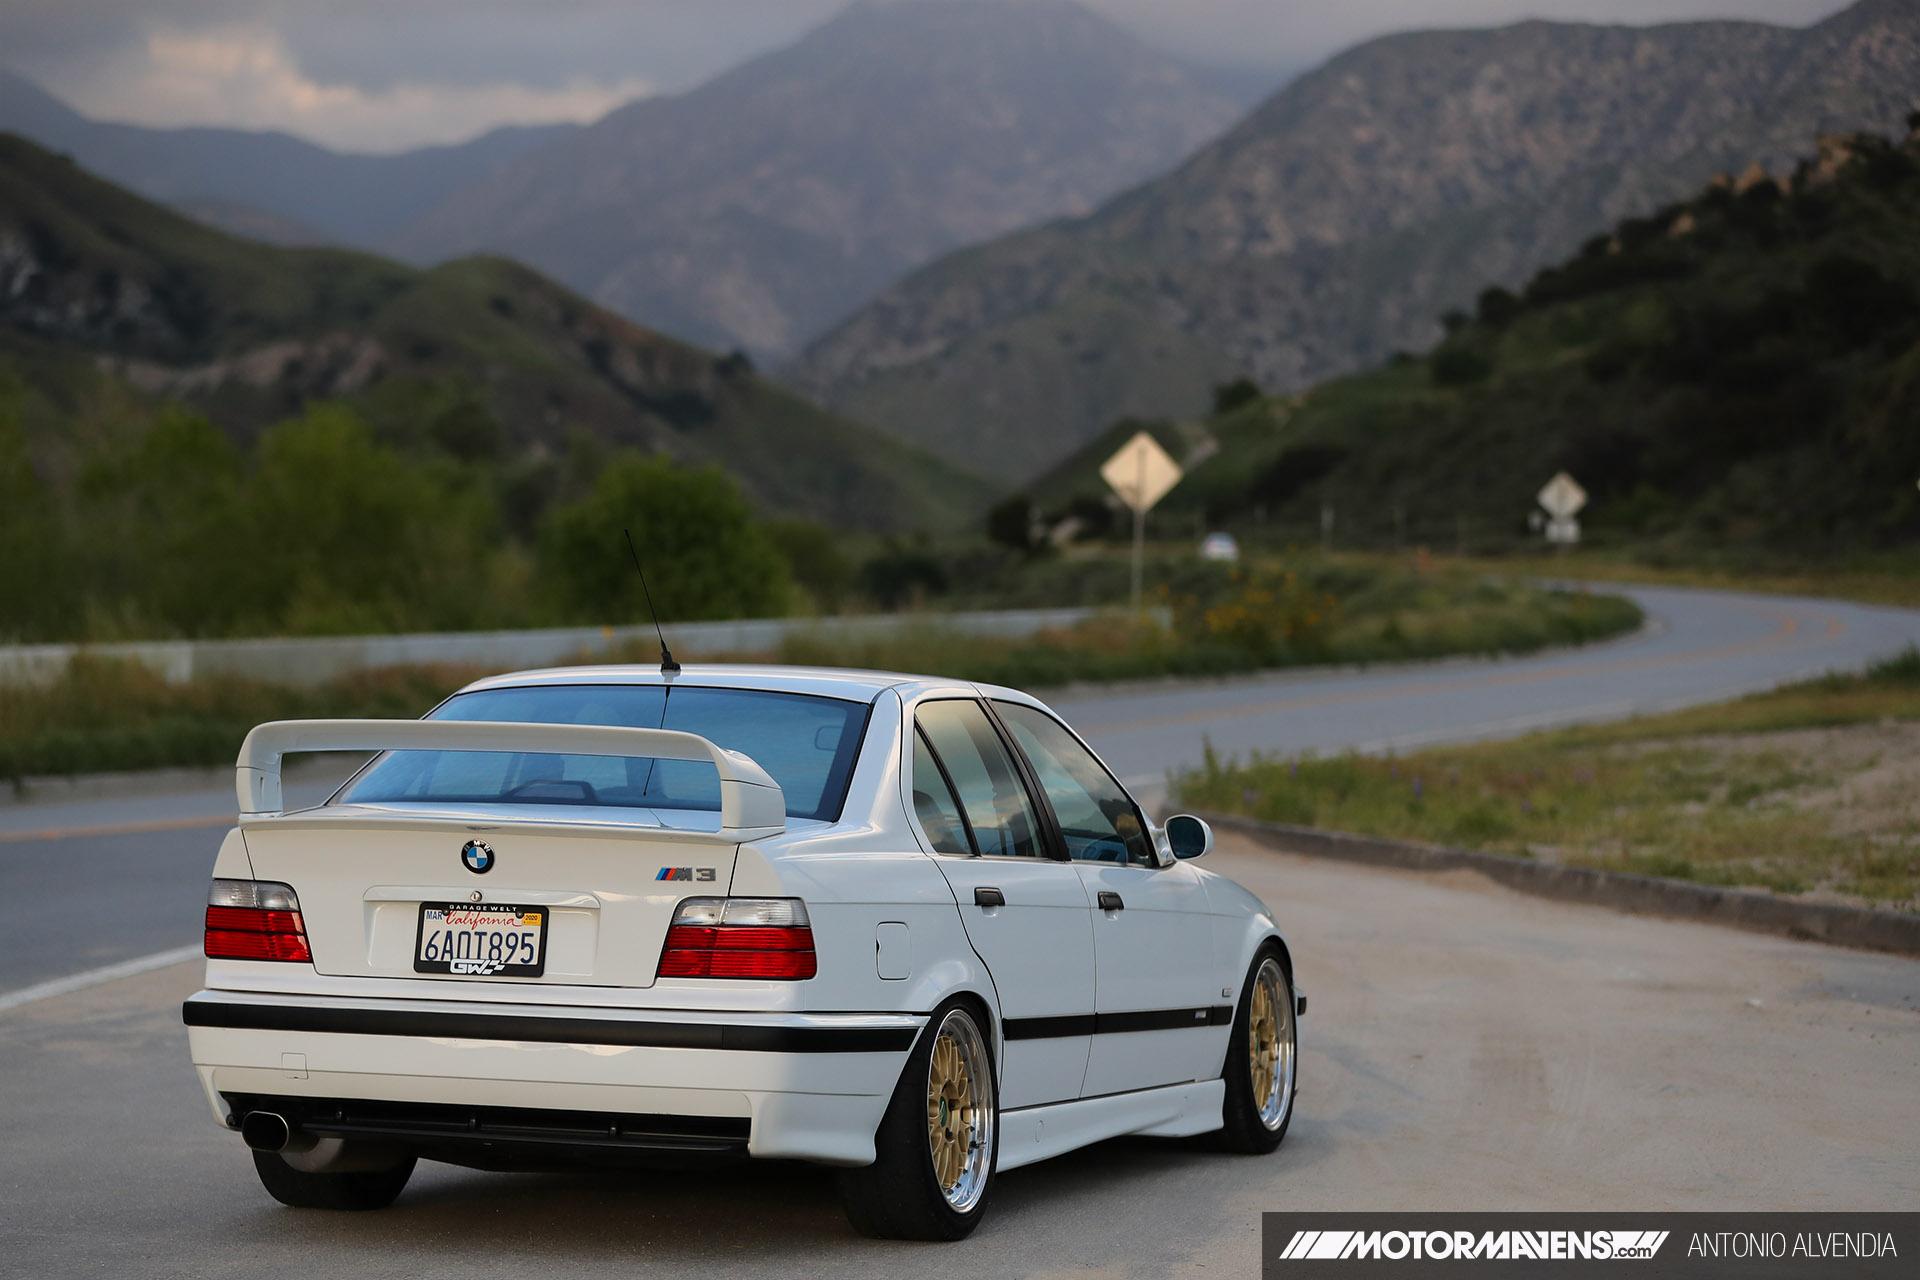 E36 BMW M3 4door S54 swap 5 speed Getrag BBS M345 Garage Welt 1DX21273